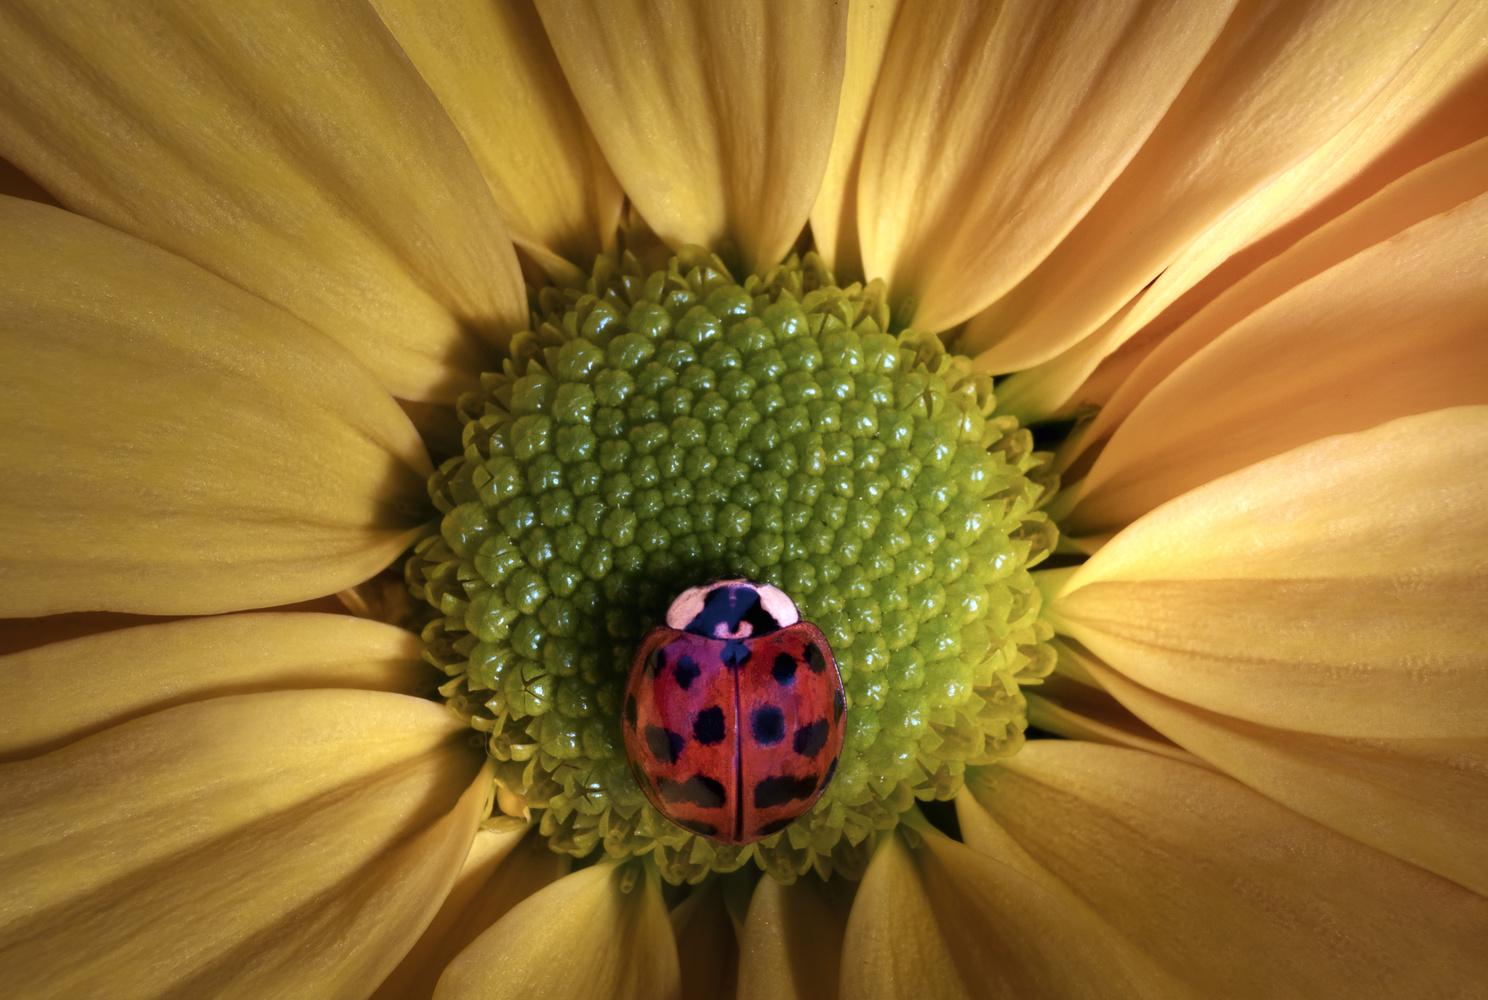 Ladybug by Stephen Clough